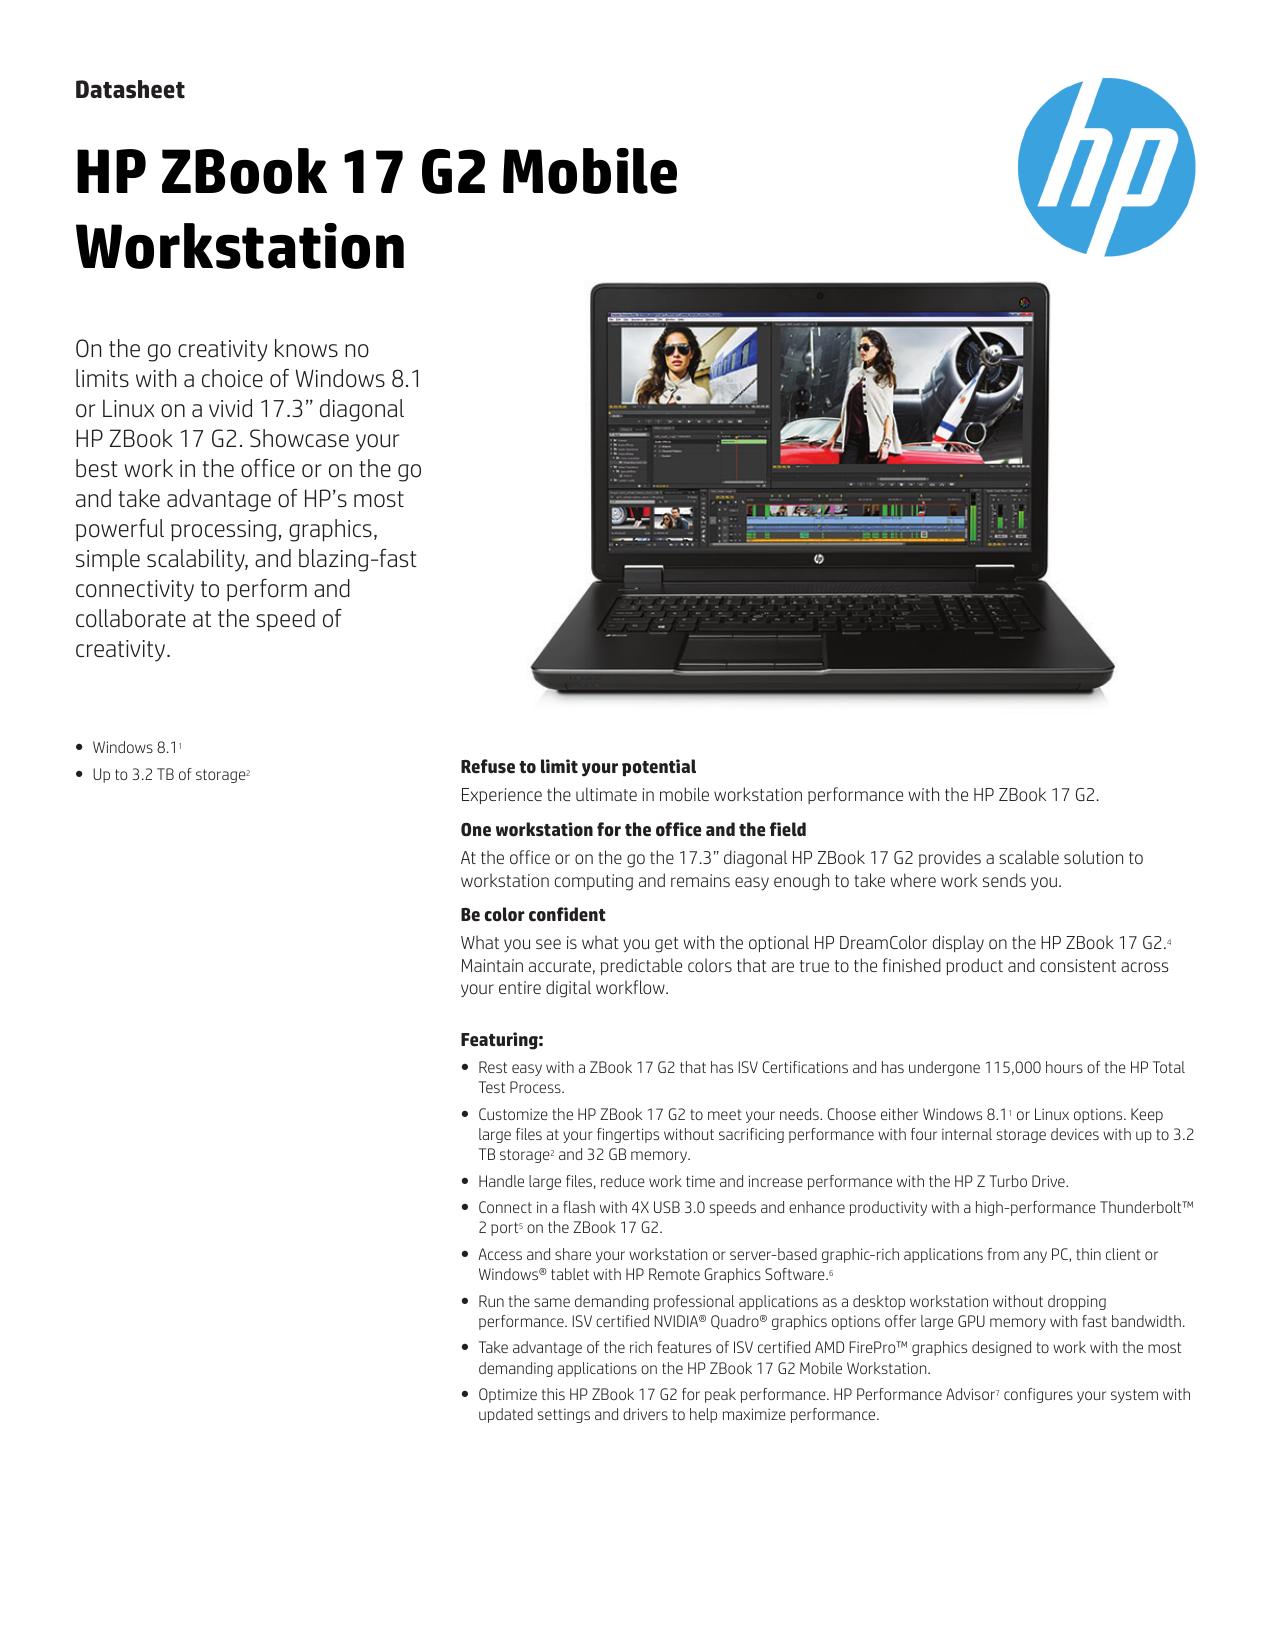 HP ZBook 17 G2 Mobile Workstation Datasheet | manualzz com